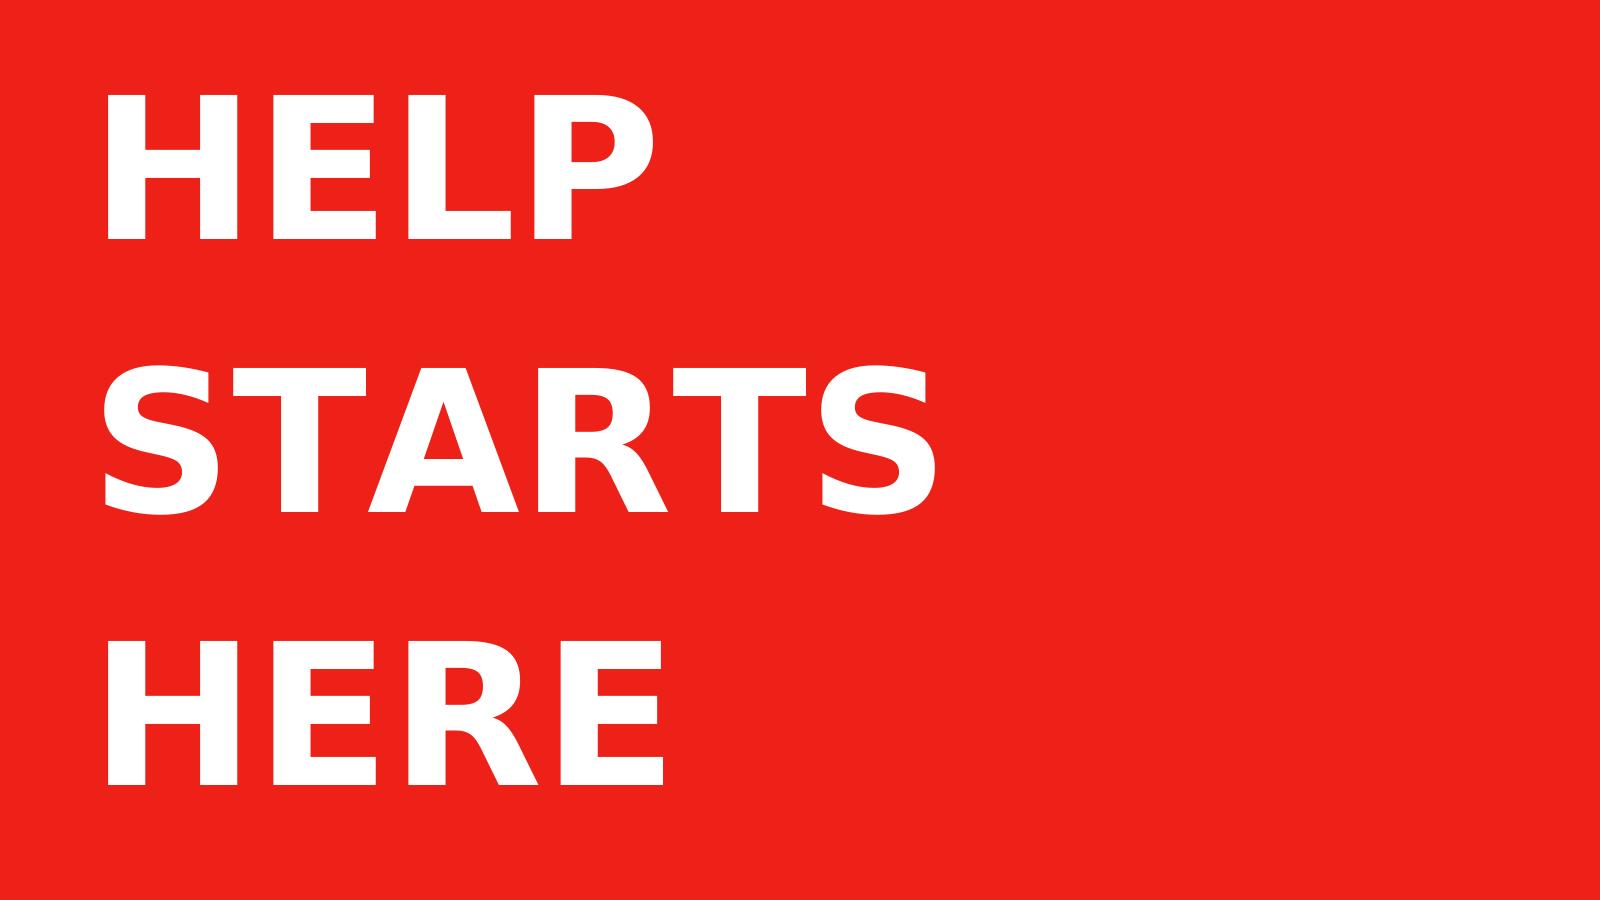 HELP STARTS HERE (4)